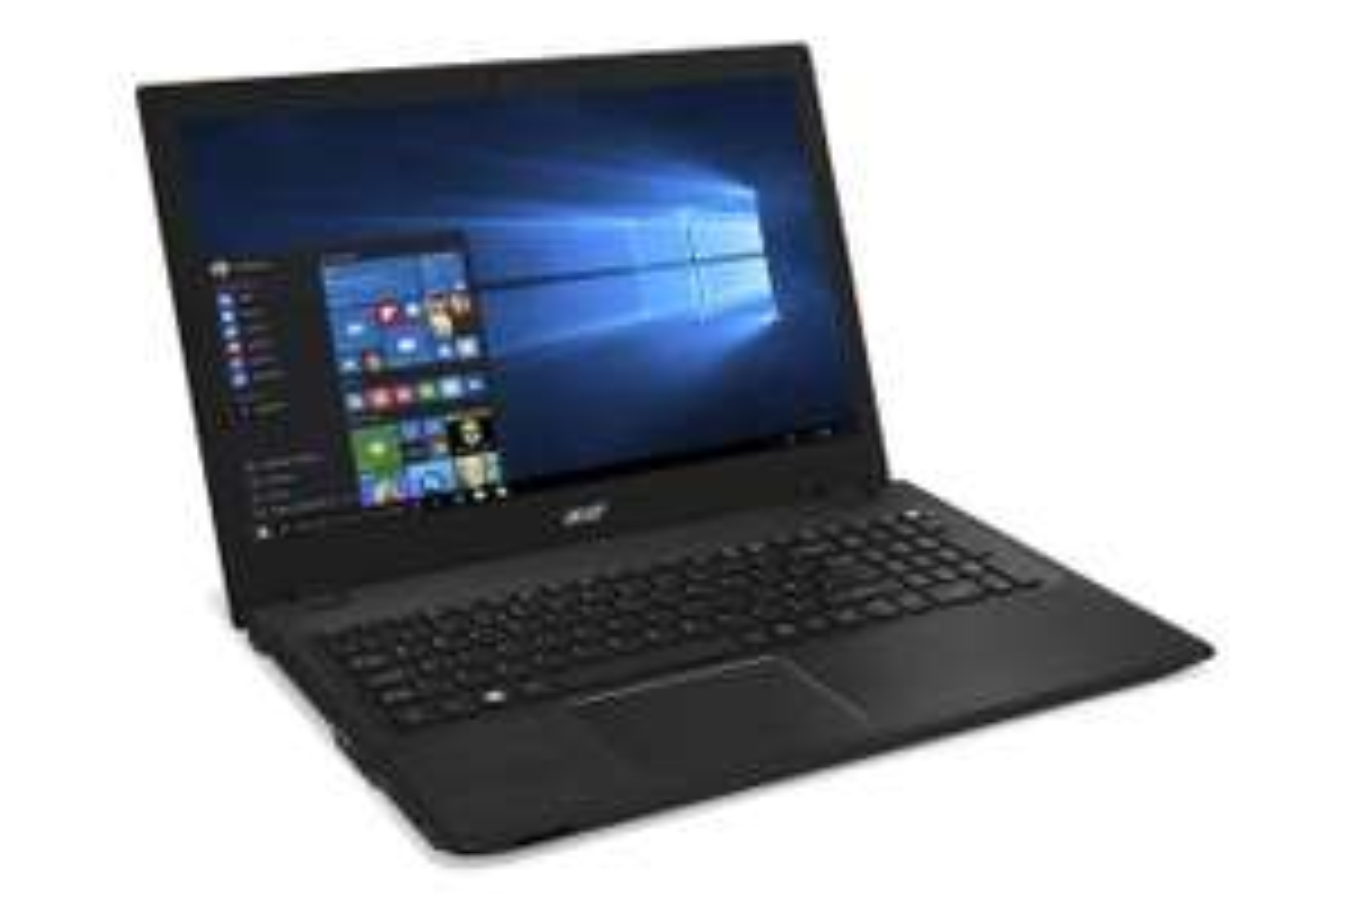 "PC portable 15"" Acer Aspire F5-571G-73ES (Intel Core i7-5500U - HDD 1 To - Ram 8 GO)"